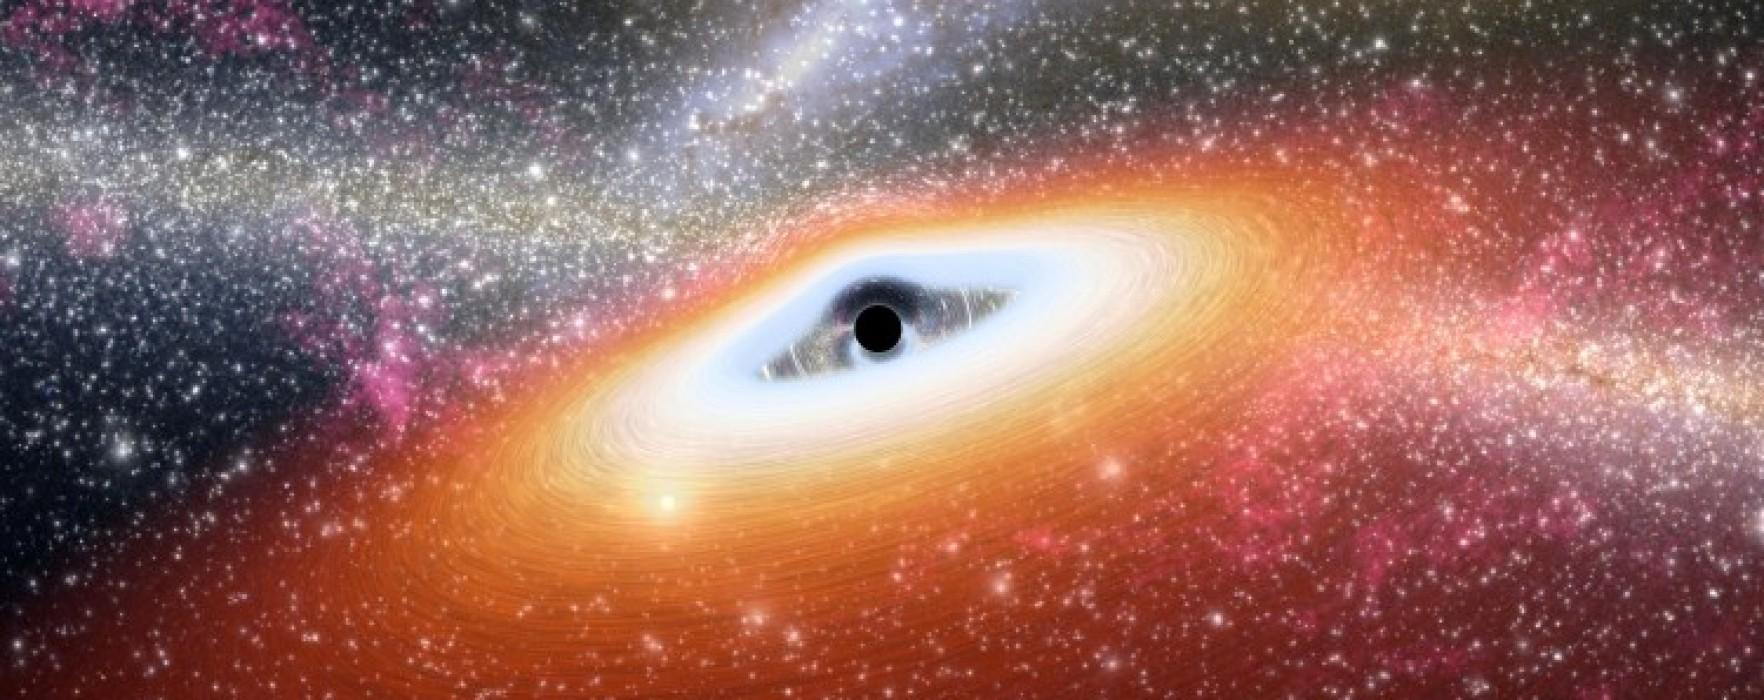 Van Leng Ah Hydrogen Zaiman Um lo…. Black Holes man maw?